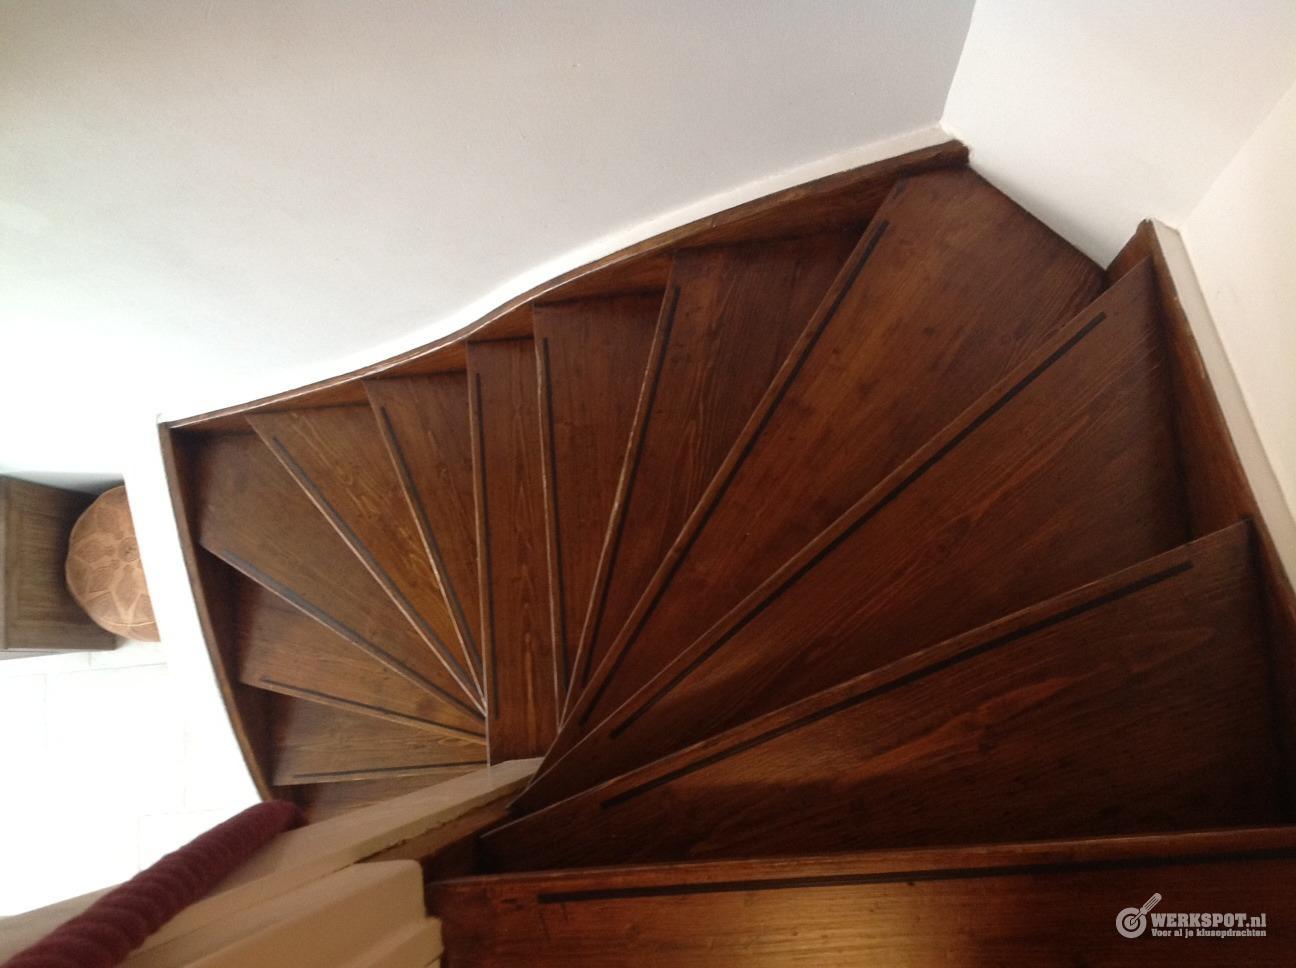 houten trap schuren lakken beitsen werkspot On trap schuren